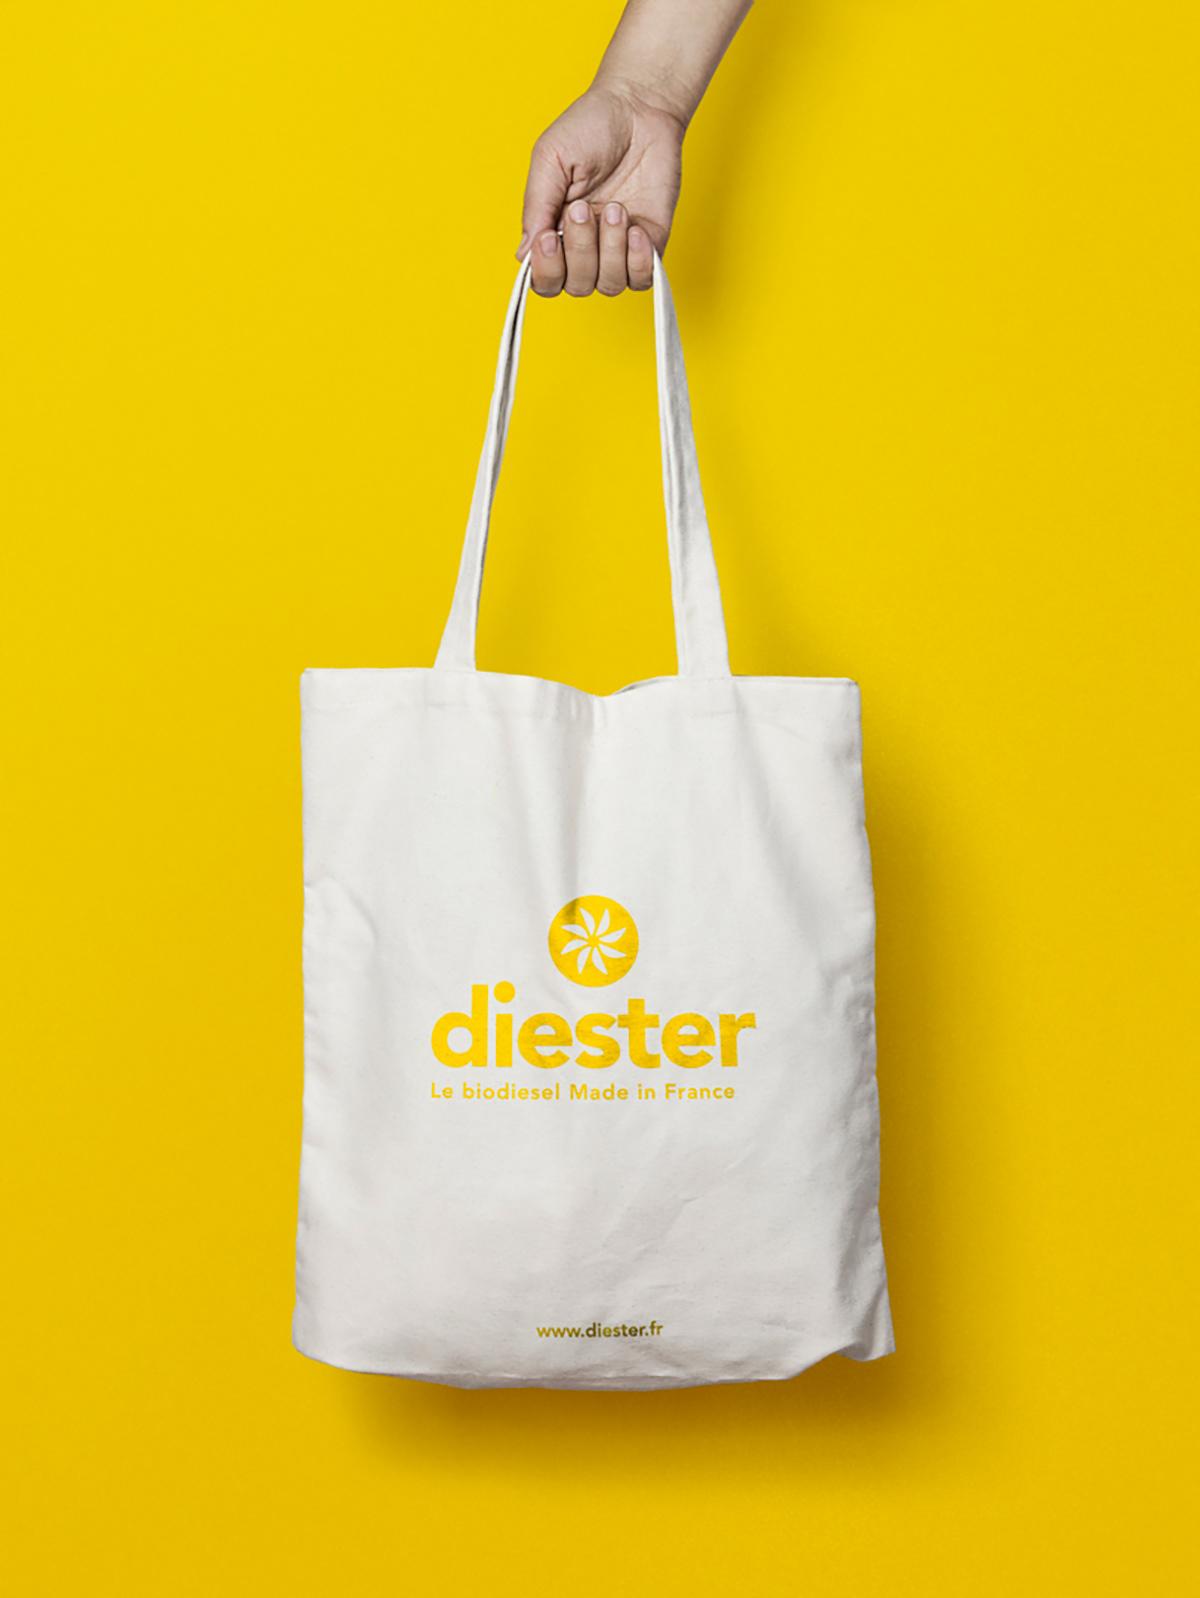 Image may contain: yellow, handbag and luggage and bags